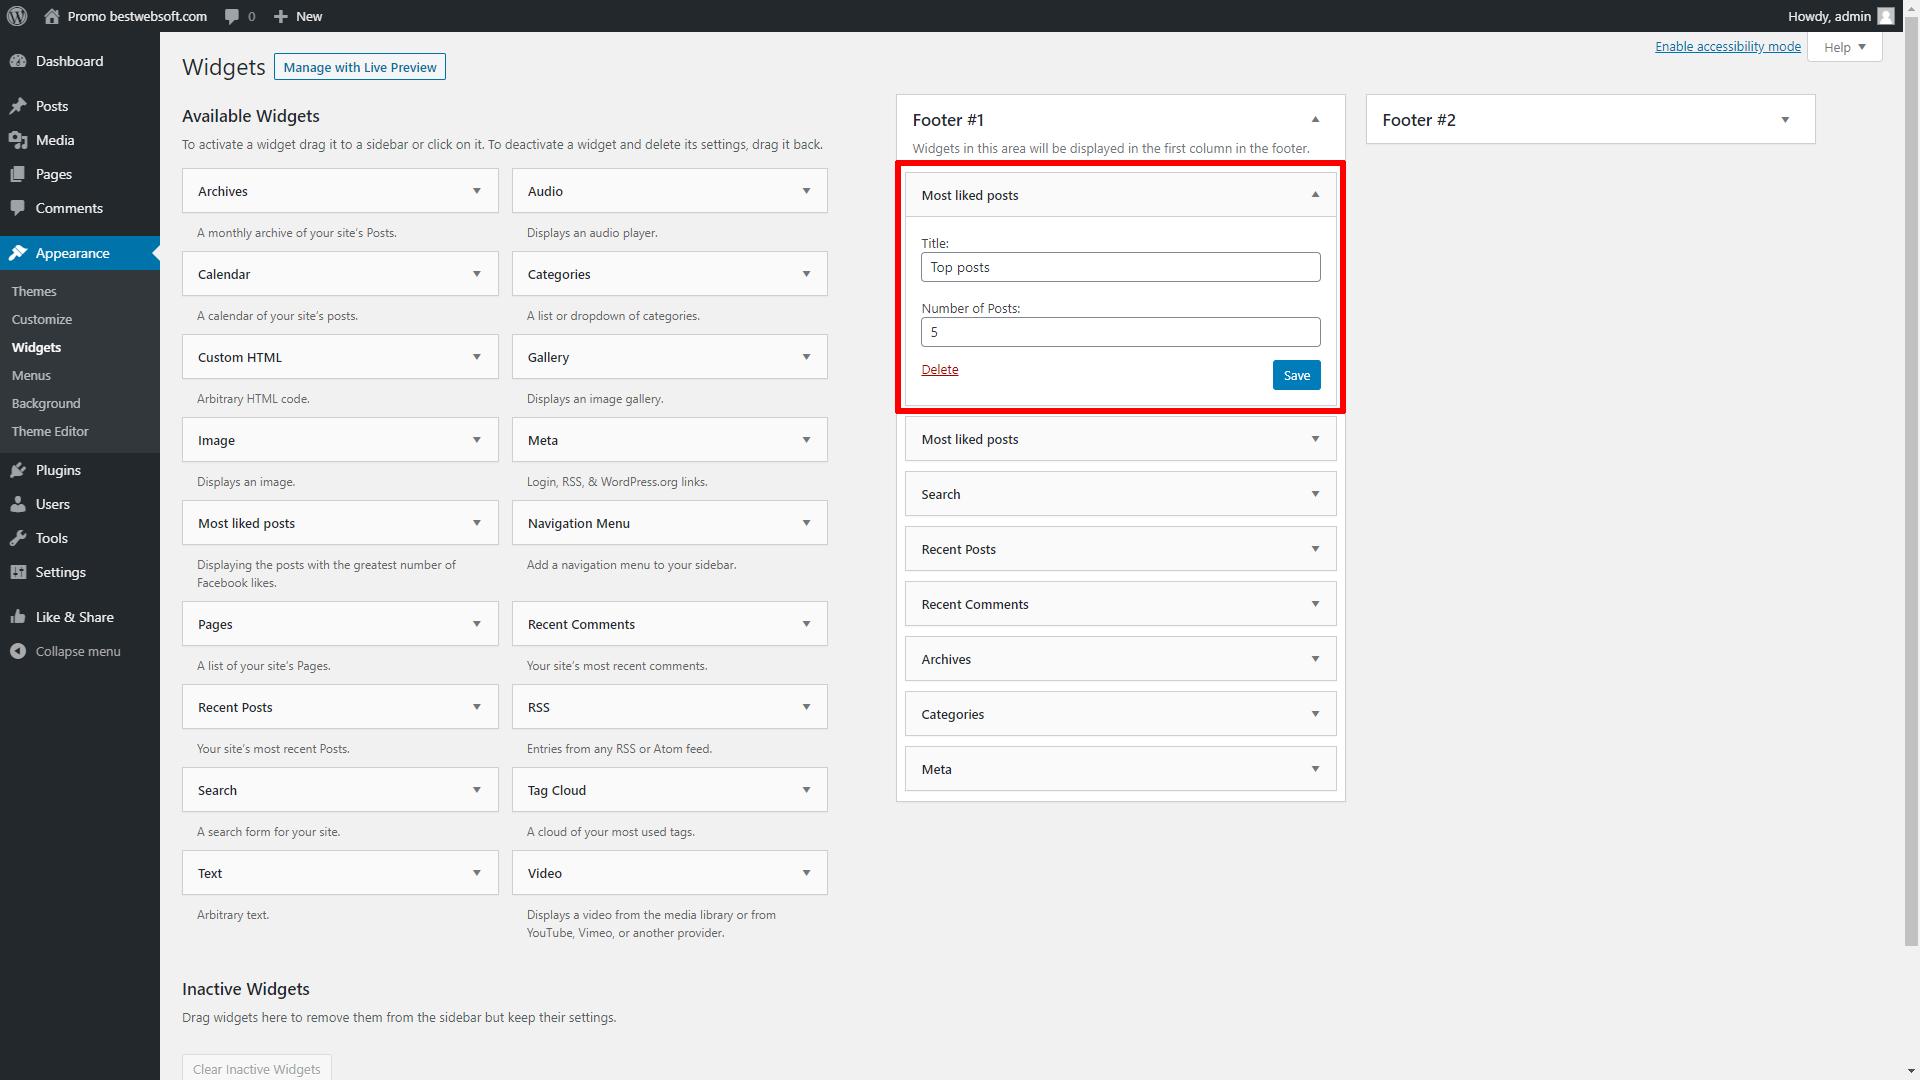 bestwebsoft's like & share screenshot 4